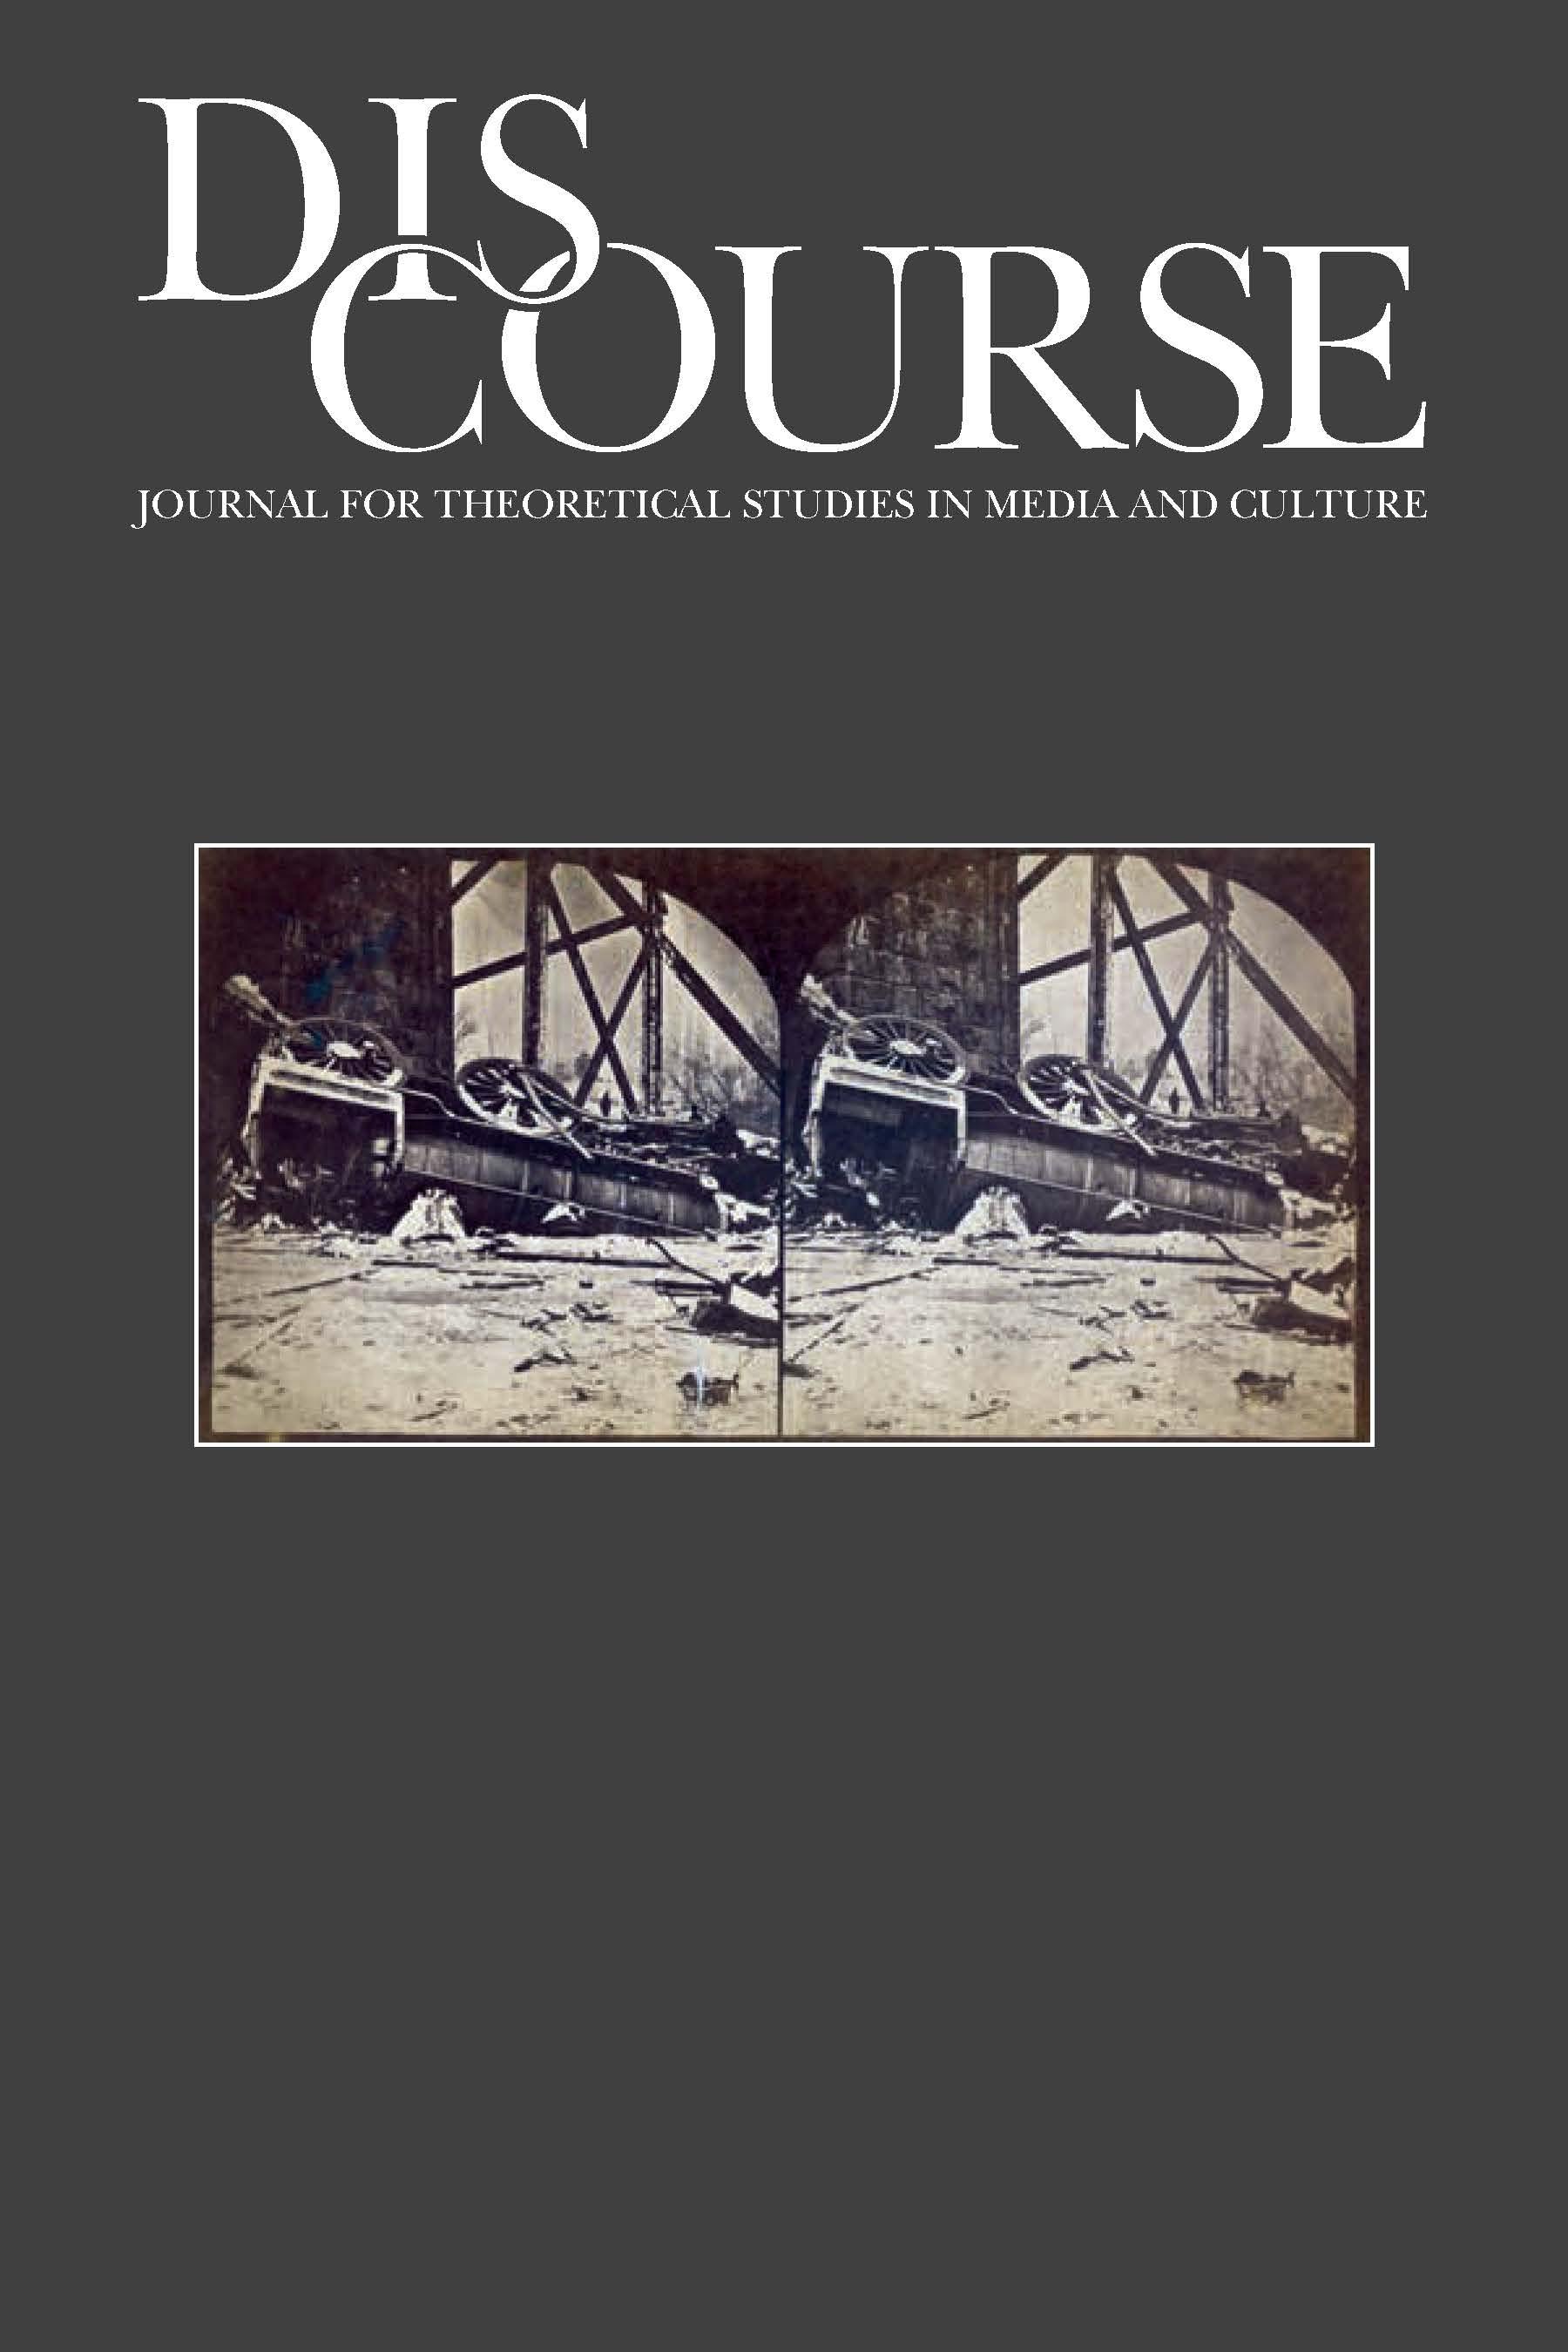 Discourse: Volume 43, Number 1, Winter 2021